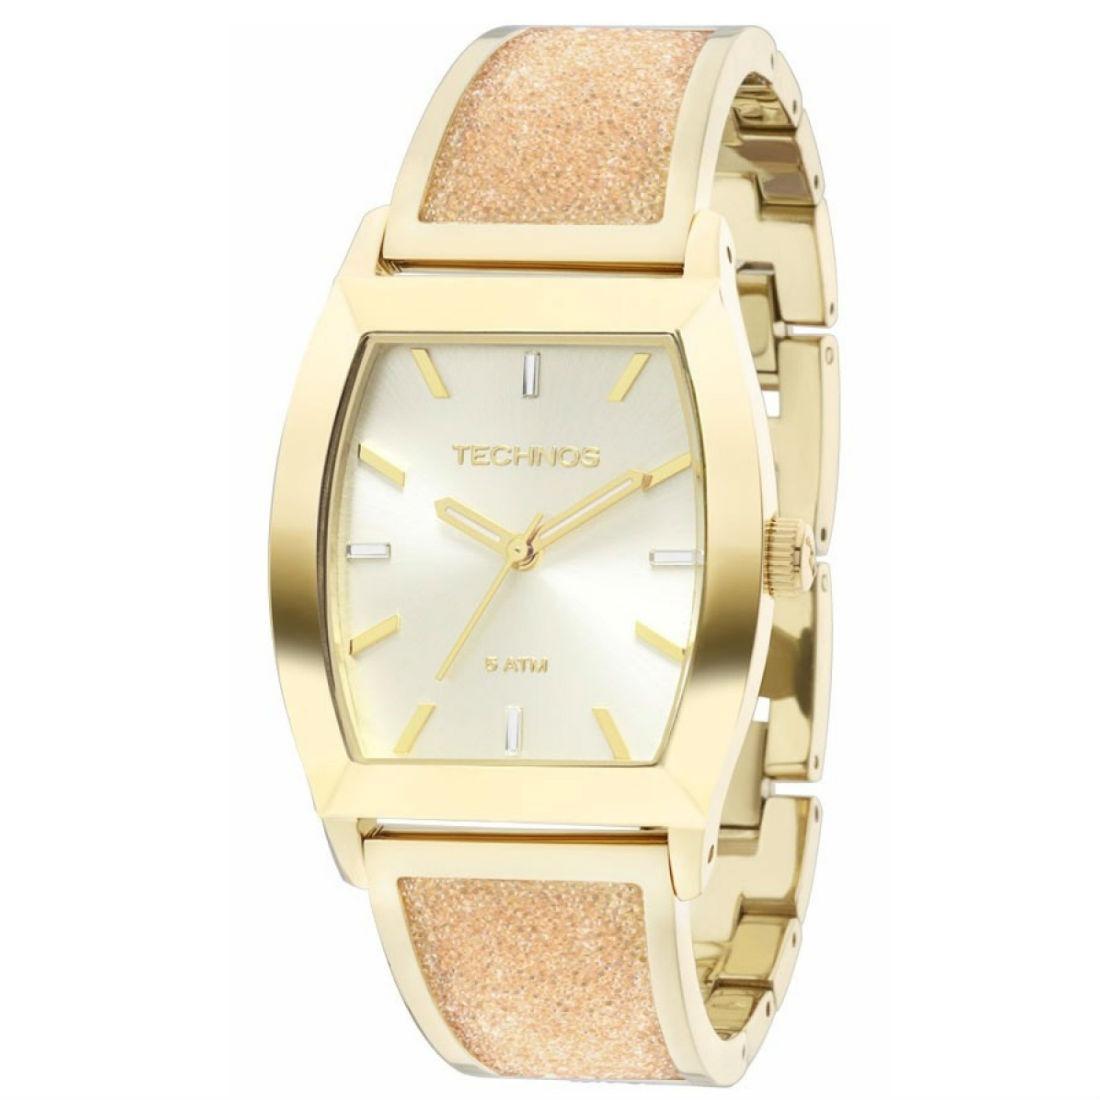 69d916fd1c9f9 relógio technos feminino elegance crystal swarovski. Carregando zoom.